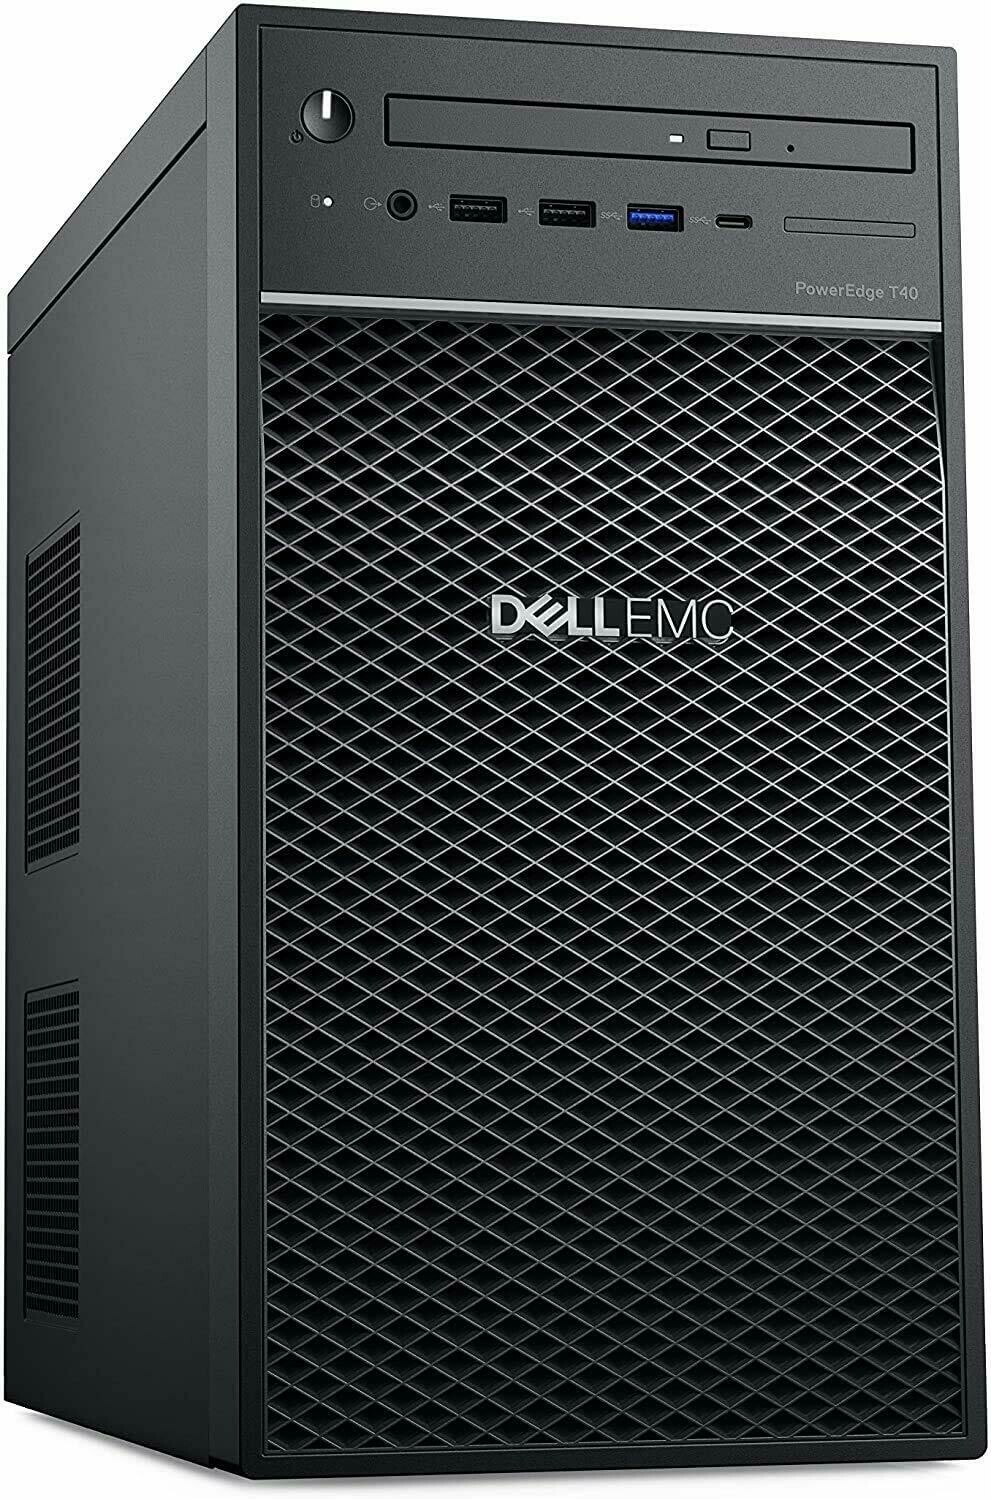 Dell PowerEdge T40 Tower Server, Intel Xeon E-2224G Processor 3.5GHz, 8GB DDR4 RAM, 1TB 7200 RPM HDD, DVDRW